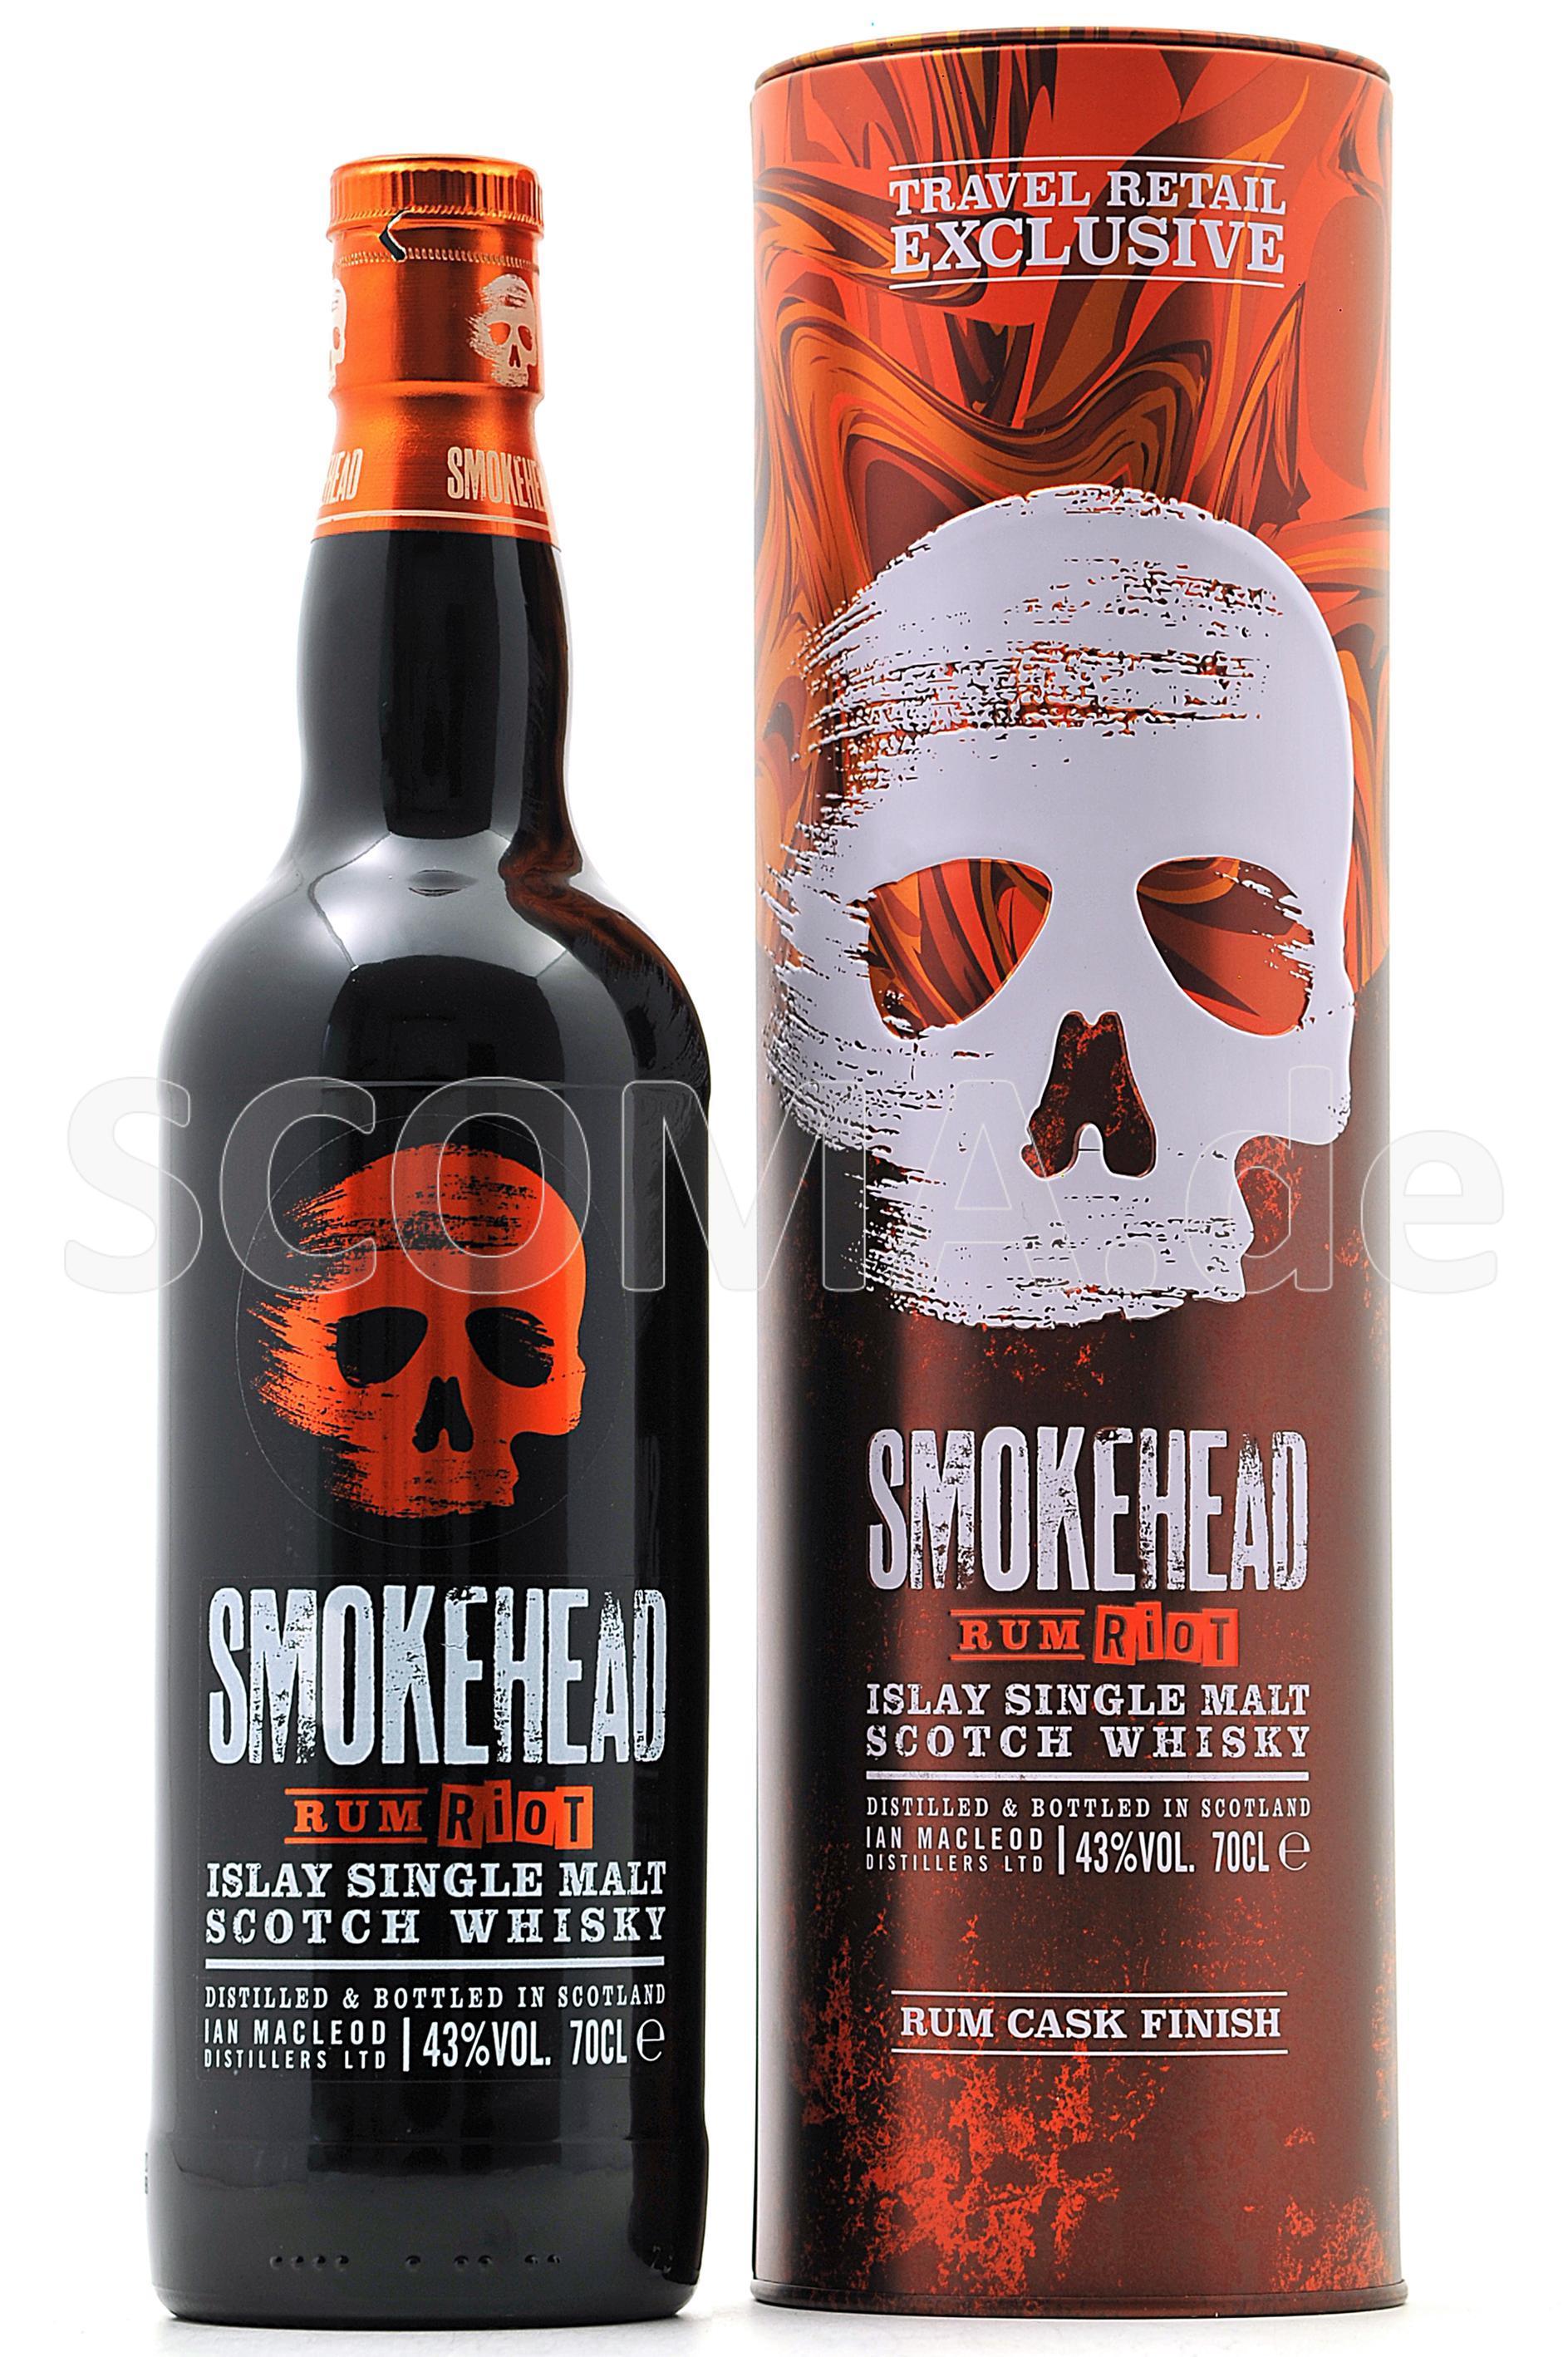 Smokehead Rum Riot Cask Finish